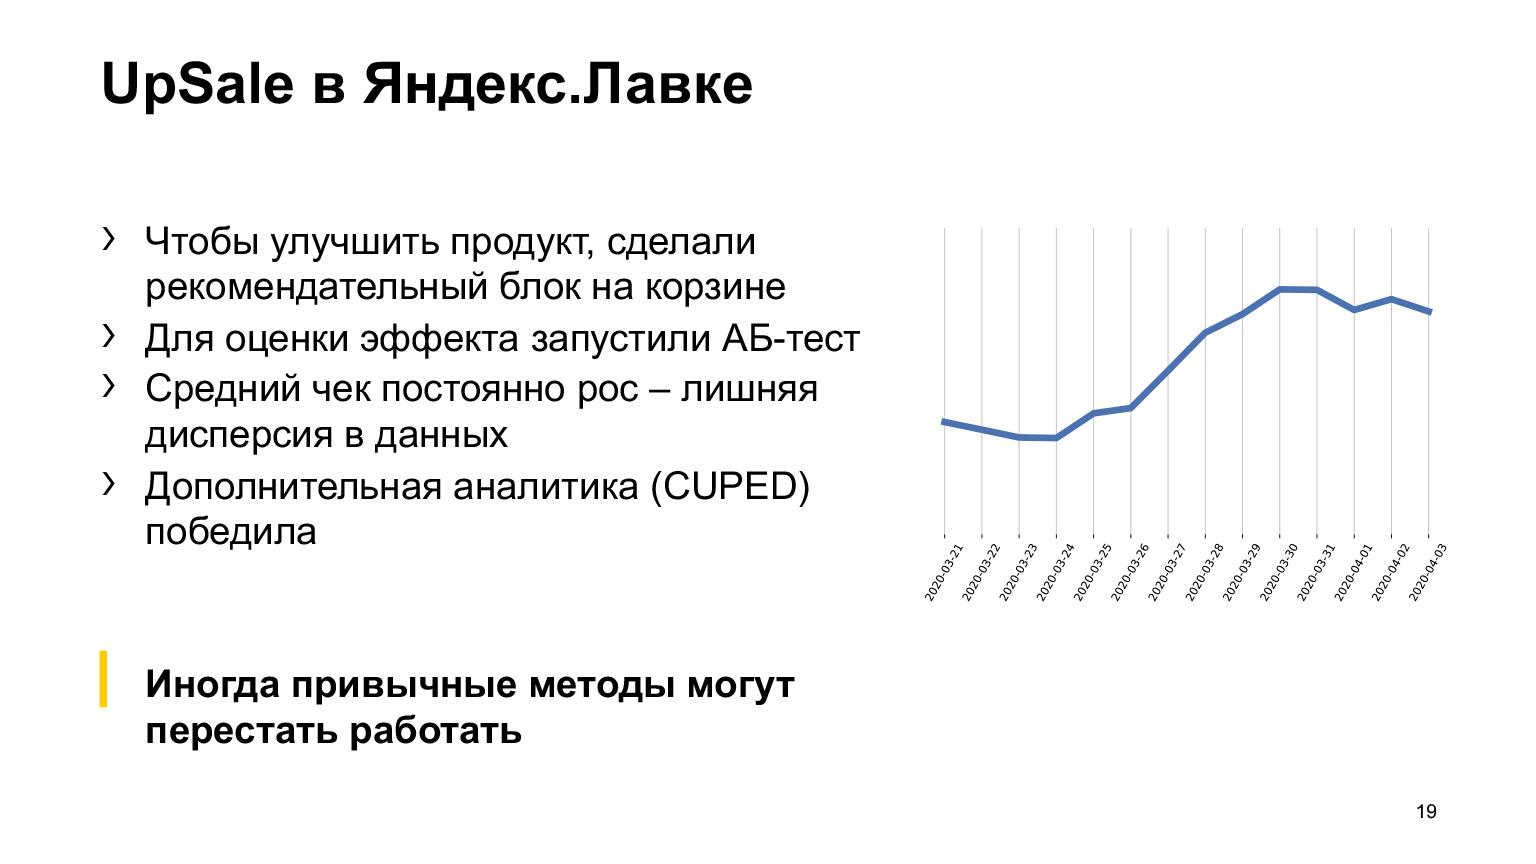 Как коронавирус повлиял на ML-проекты Такси, Еды и Лавки. Доклад Яндекса - 8